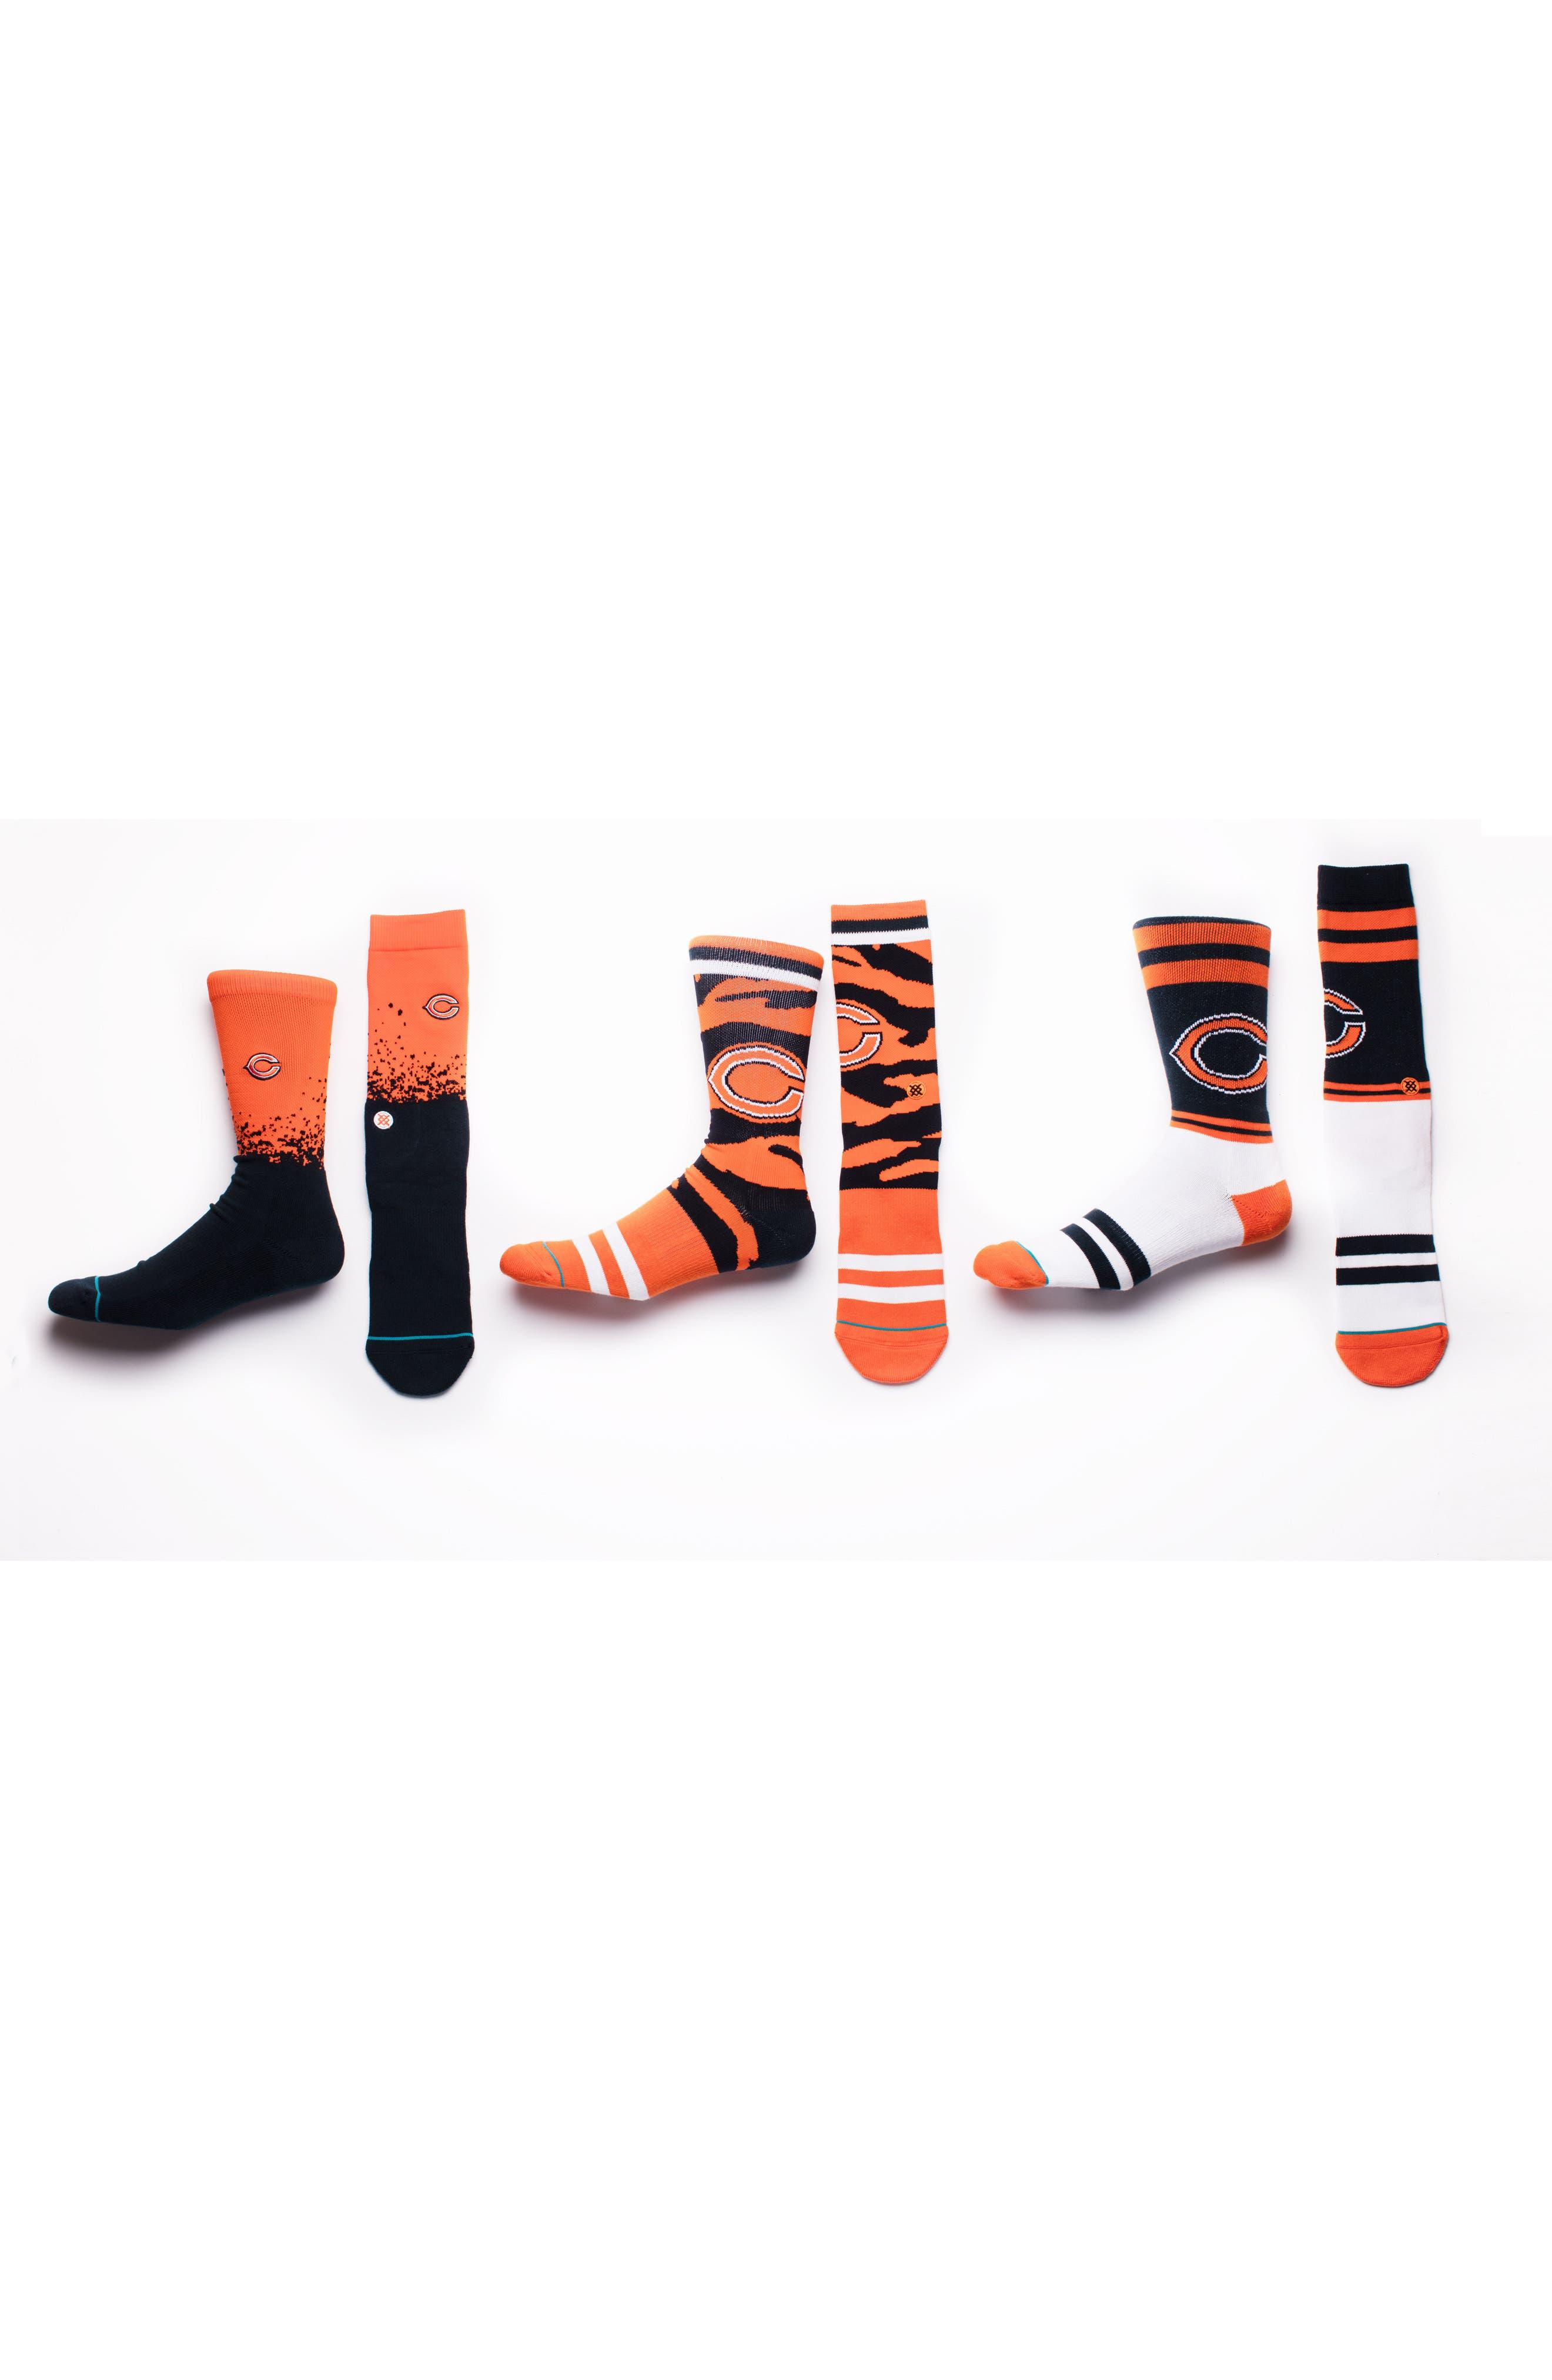 Chicago Bears - Tiger Stripe Socks,                             Alternate thumbnail 4, color,                             Orange